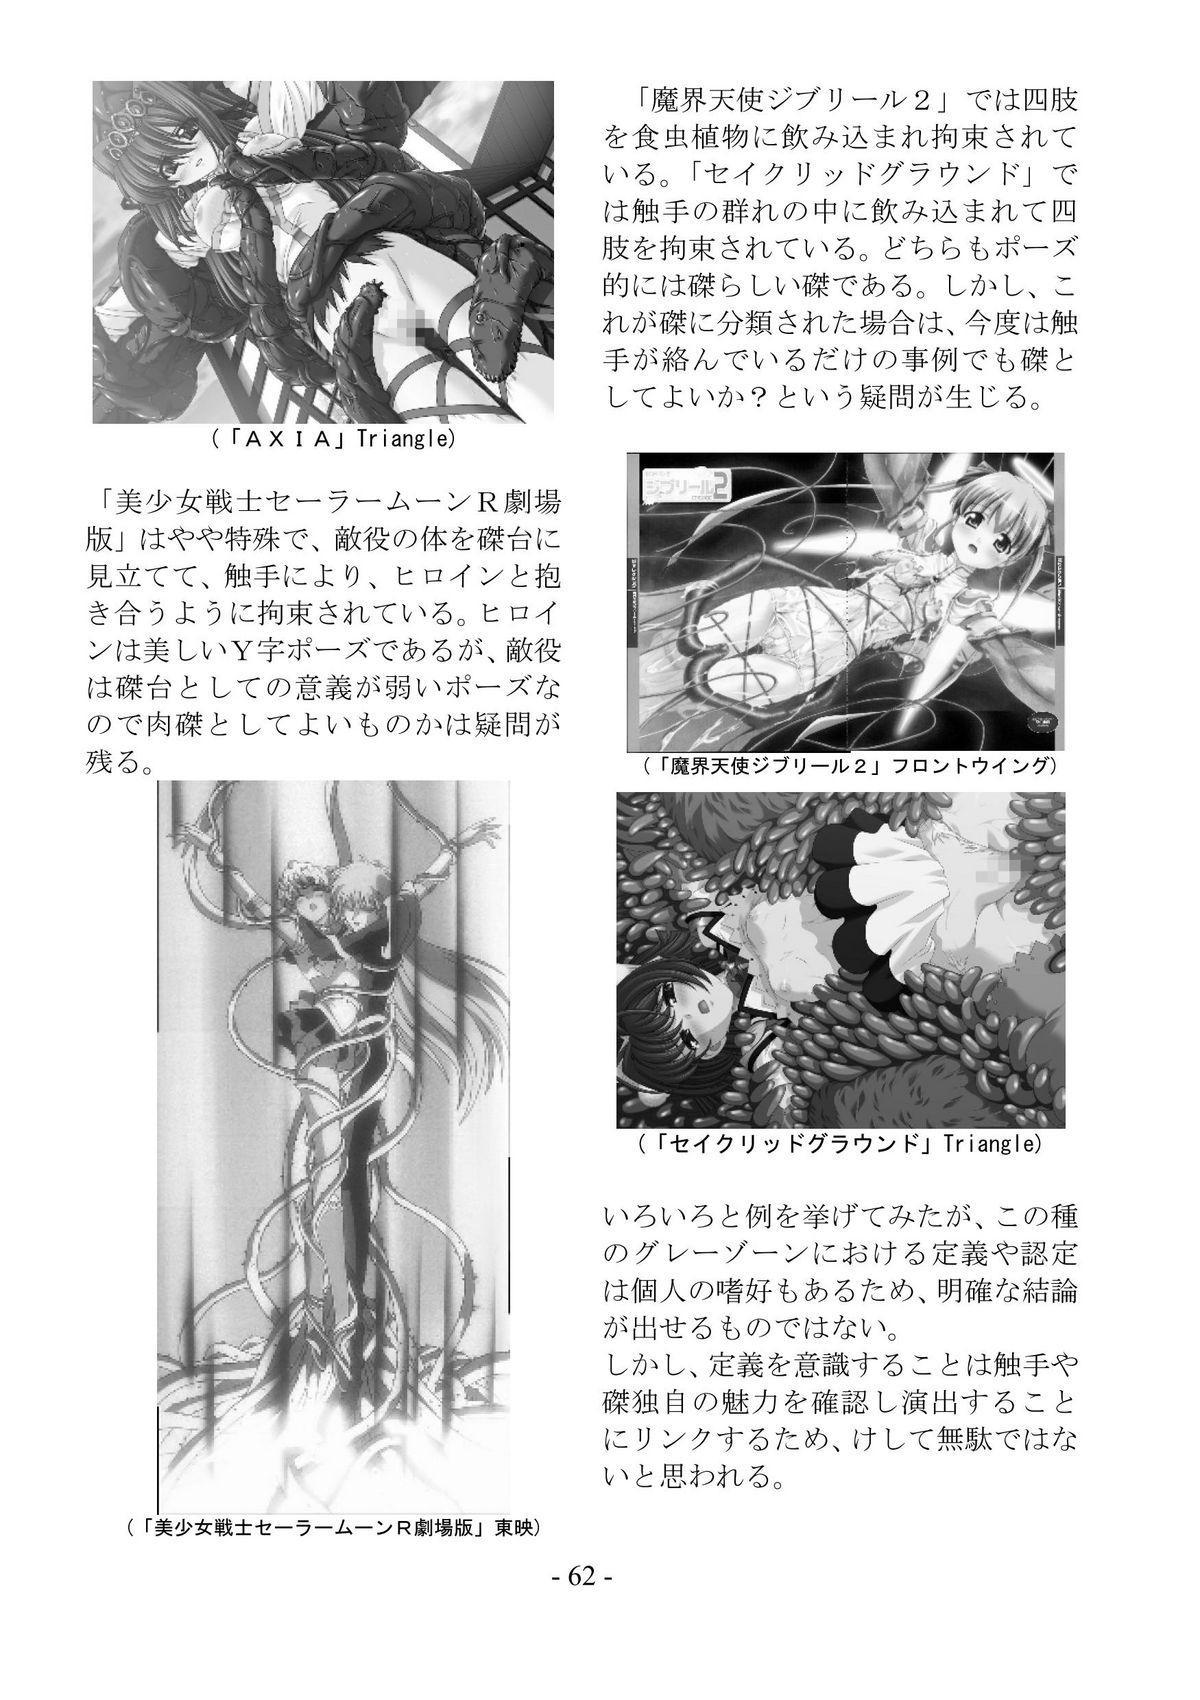 encyclopedia of crucifixion 62